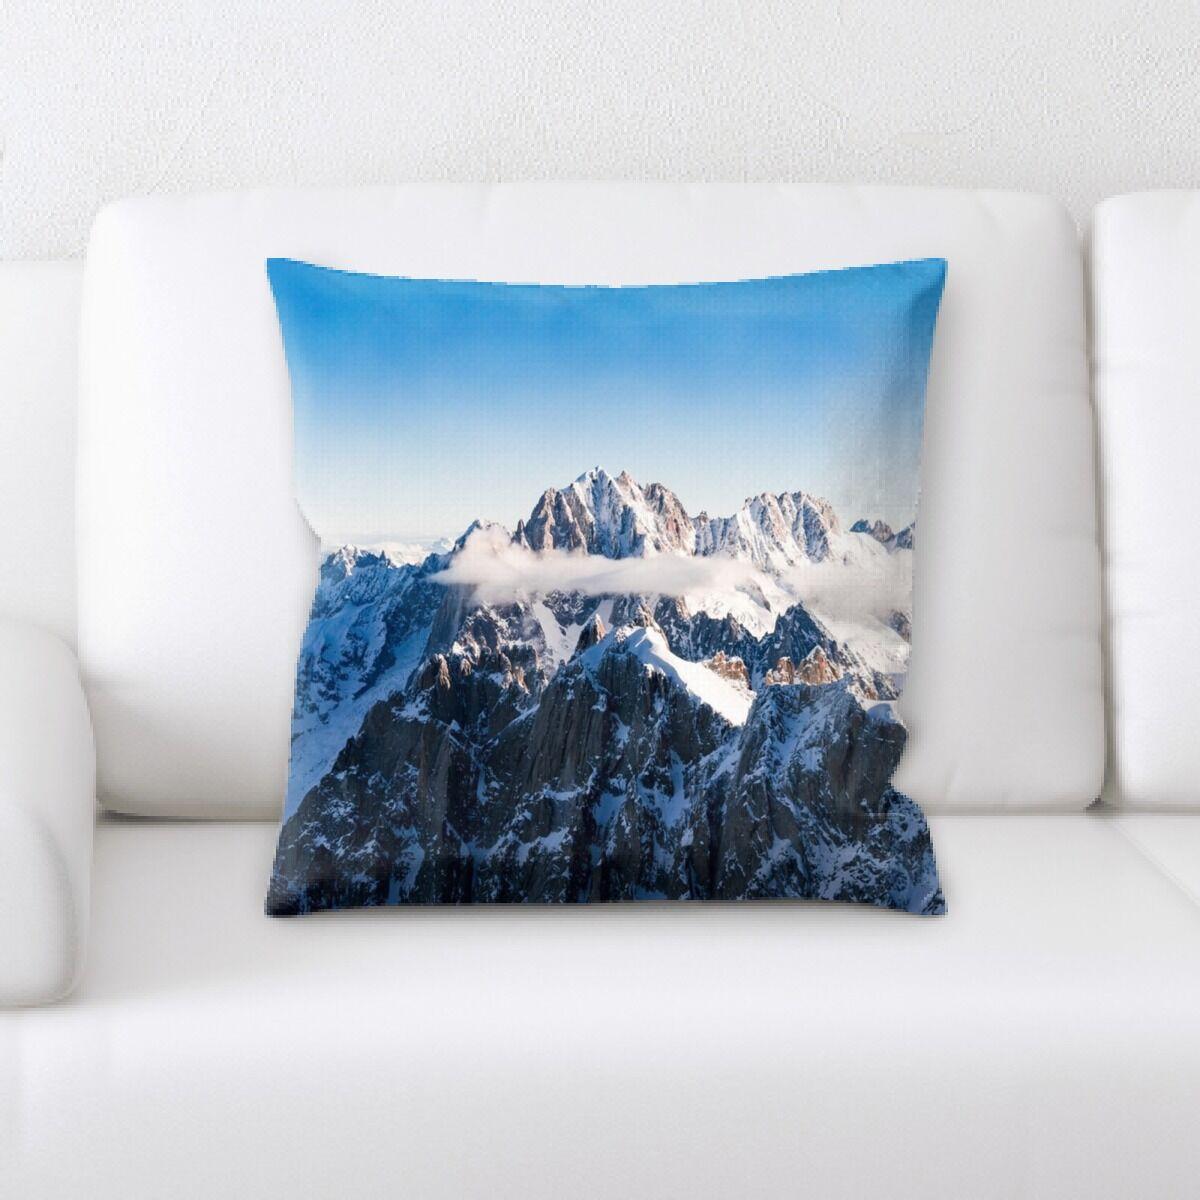 Burden Mountain and Cliffs (211) Throw Pillow